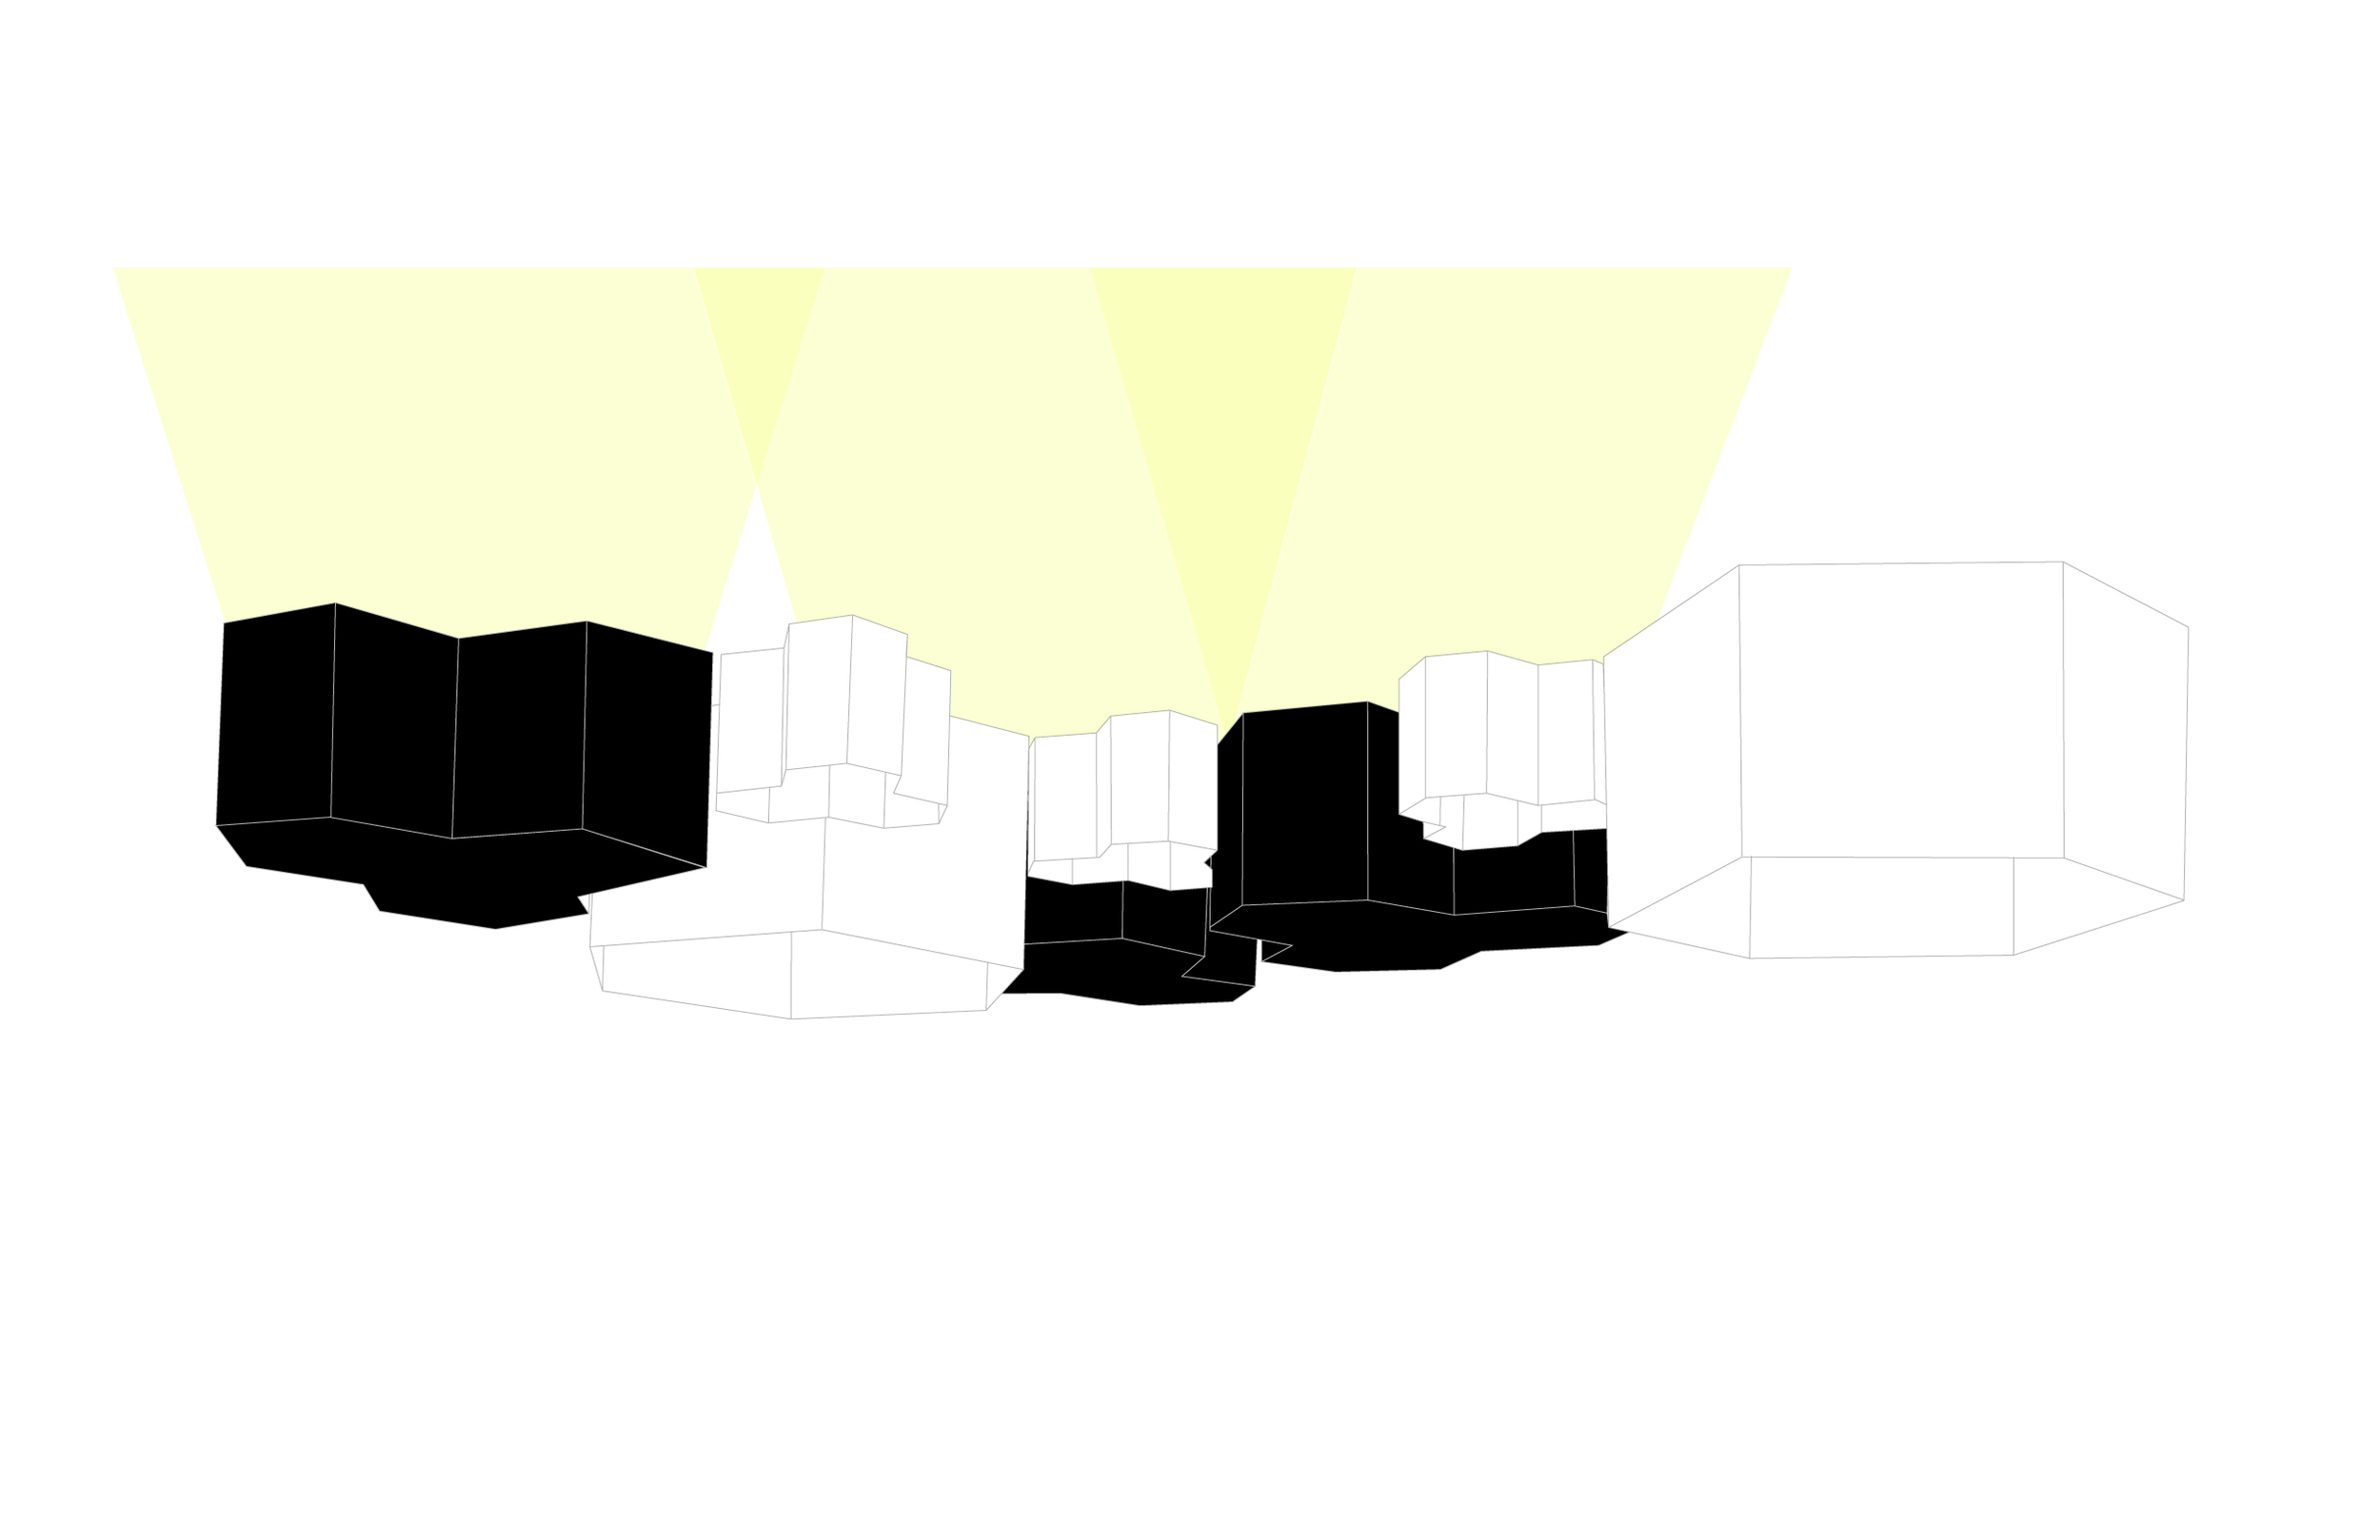 uplighting-01.jpg